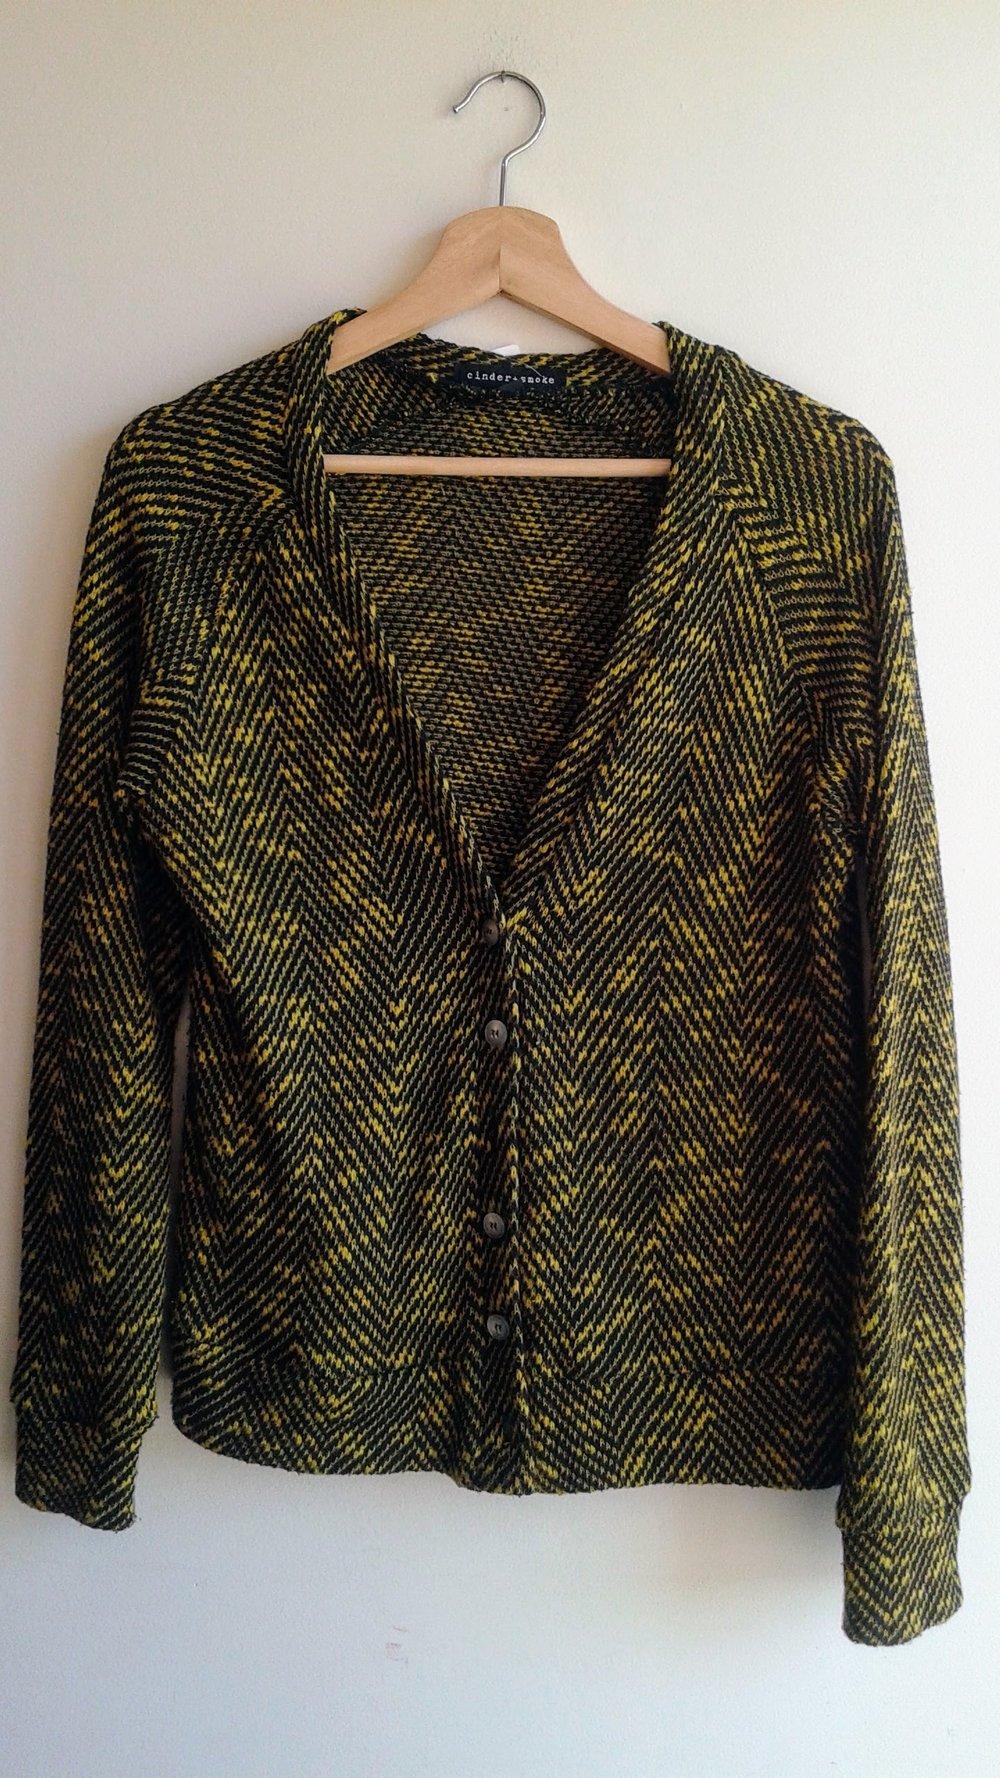 Cinder+Smoke sweater; Size M, $34